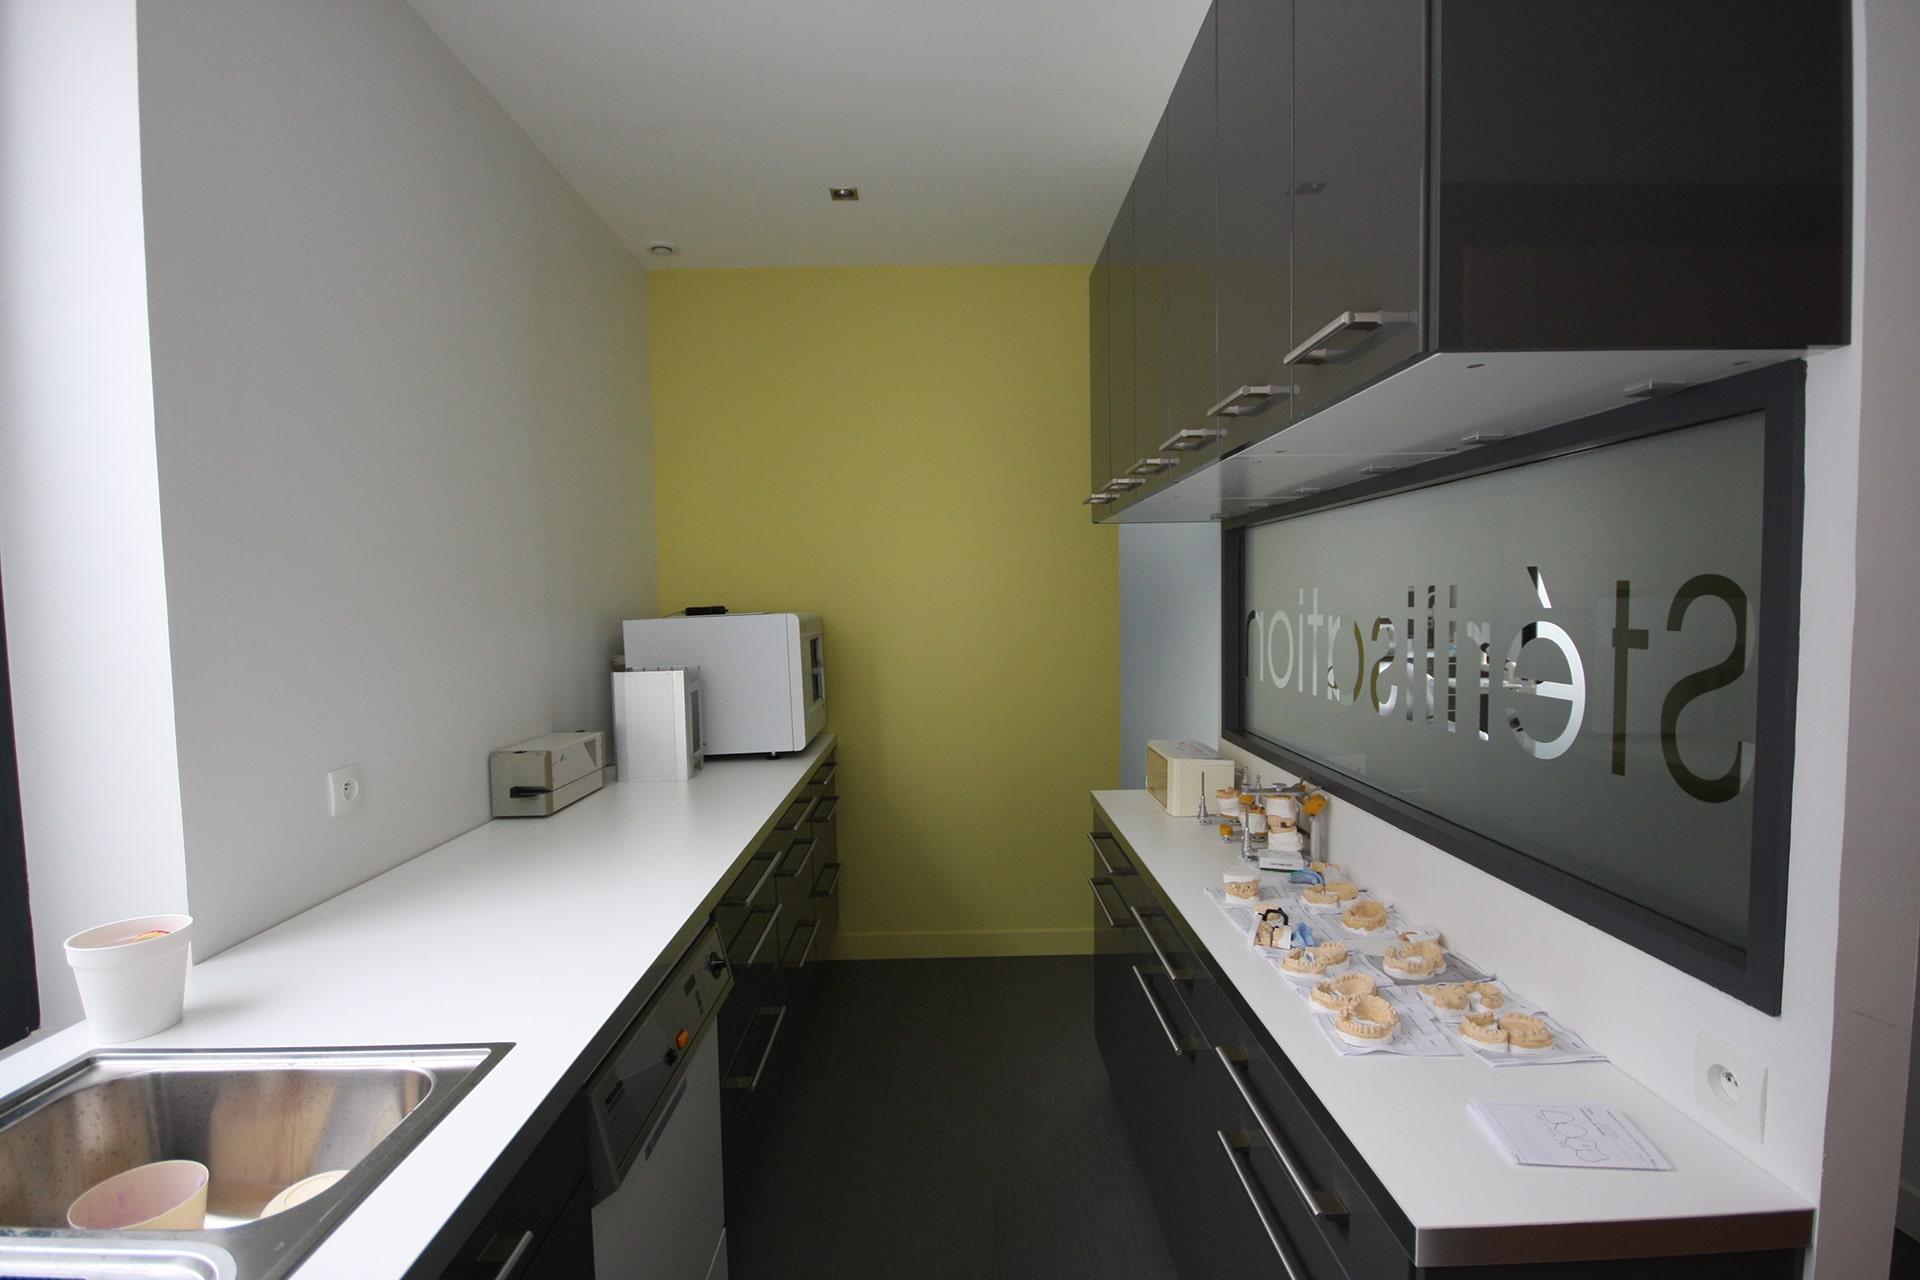 Architecte Lille Renovation Cabinet dentiste medical Nord VR-architecture